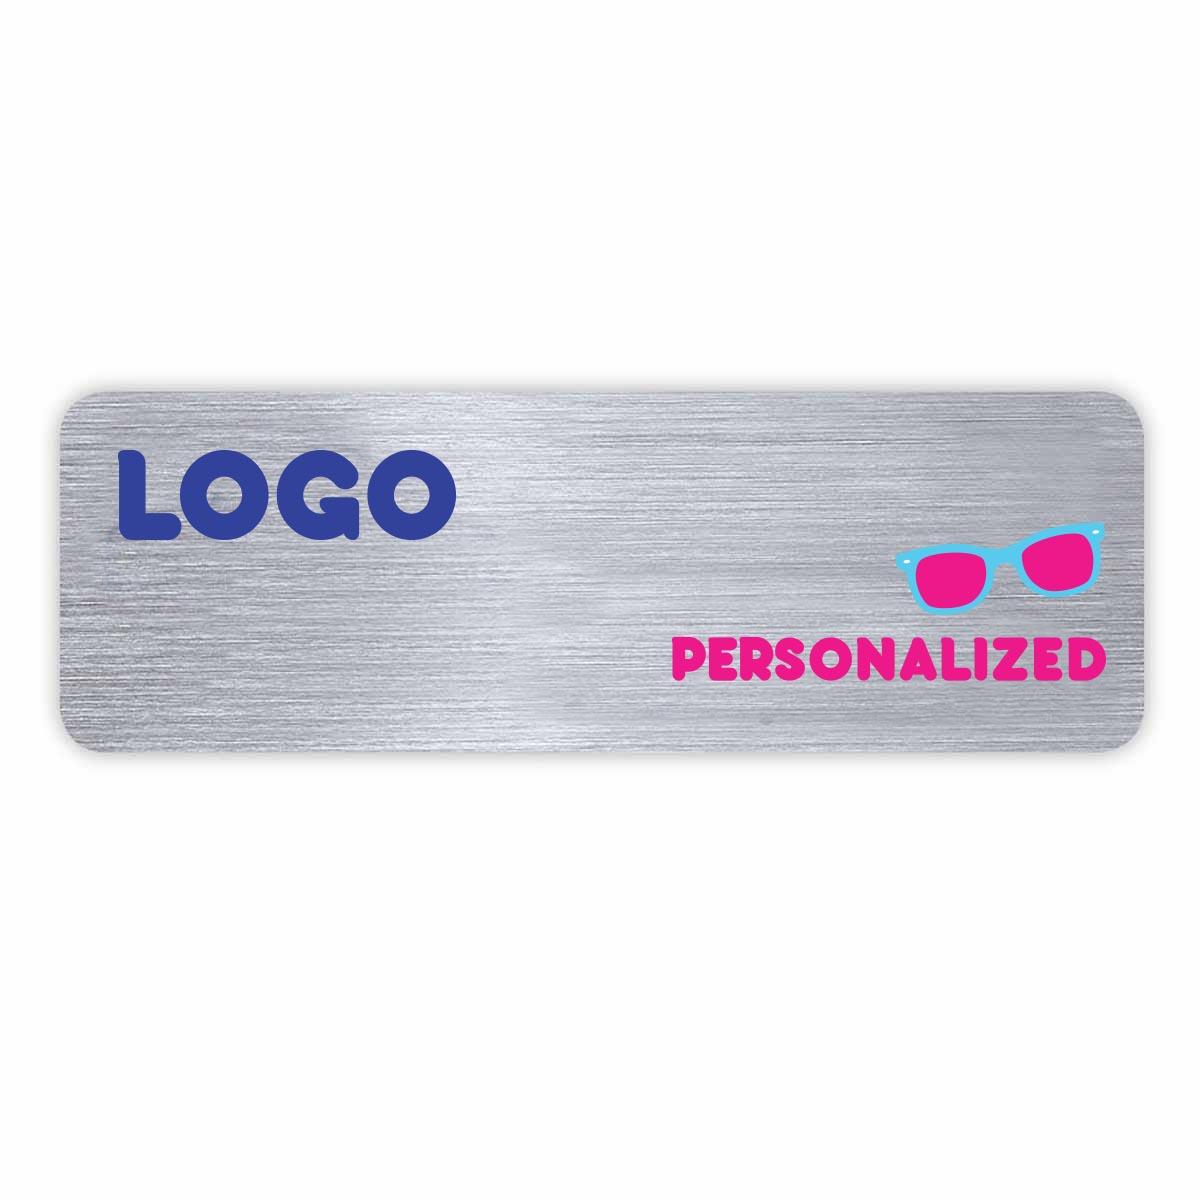 137926 custom metal badge full color one side magnetic backing